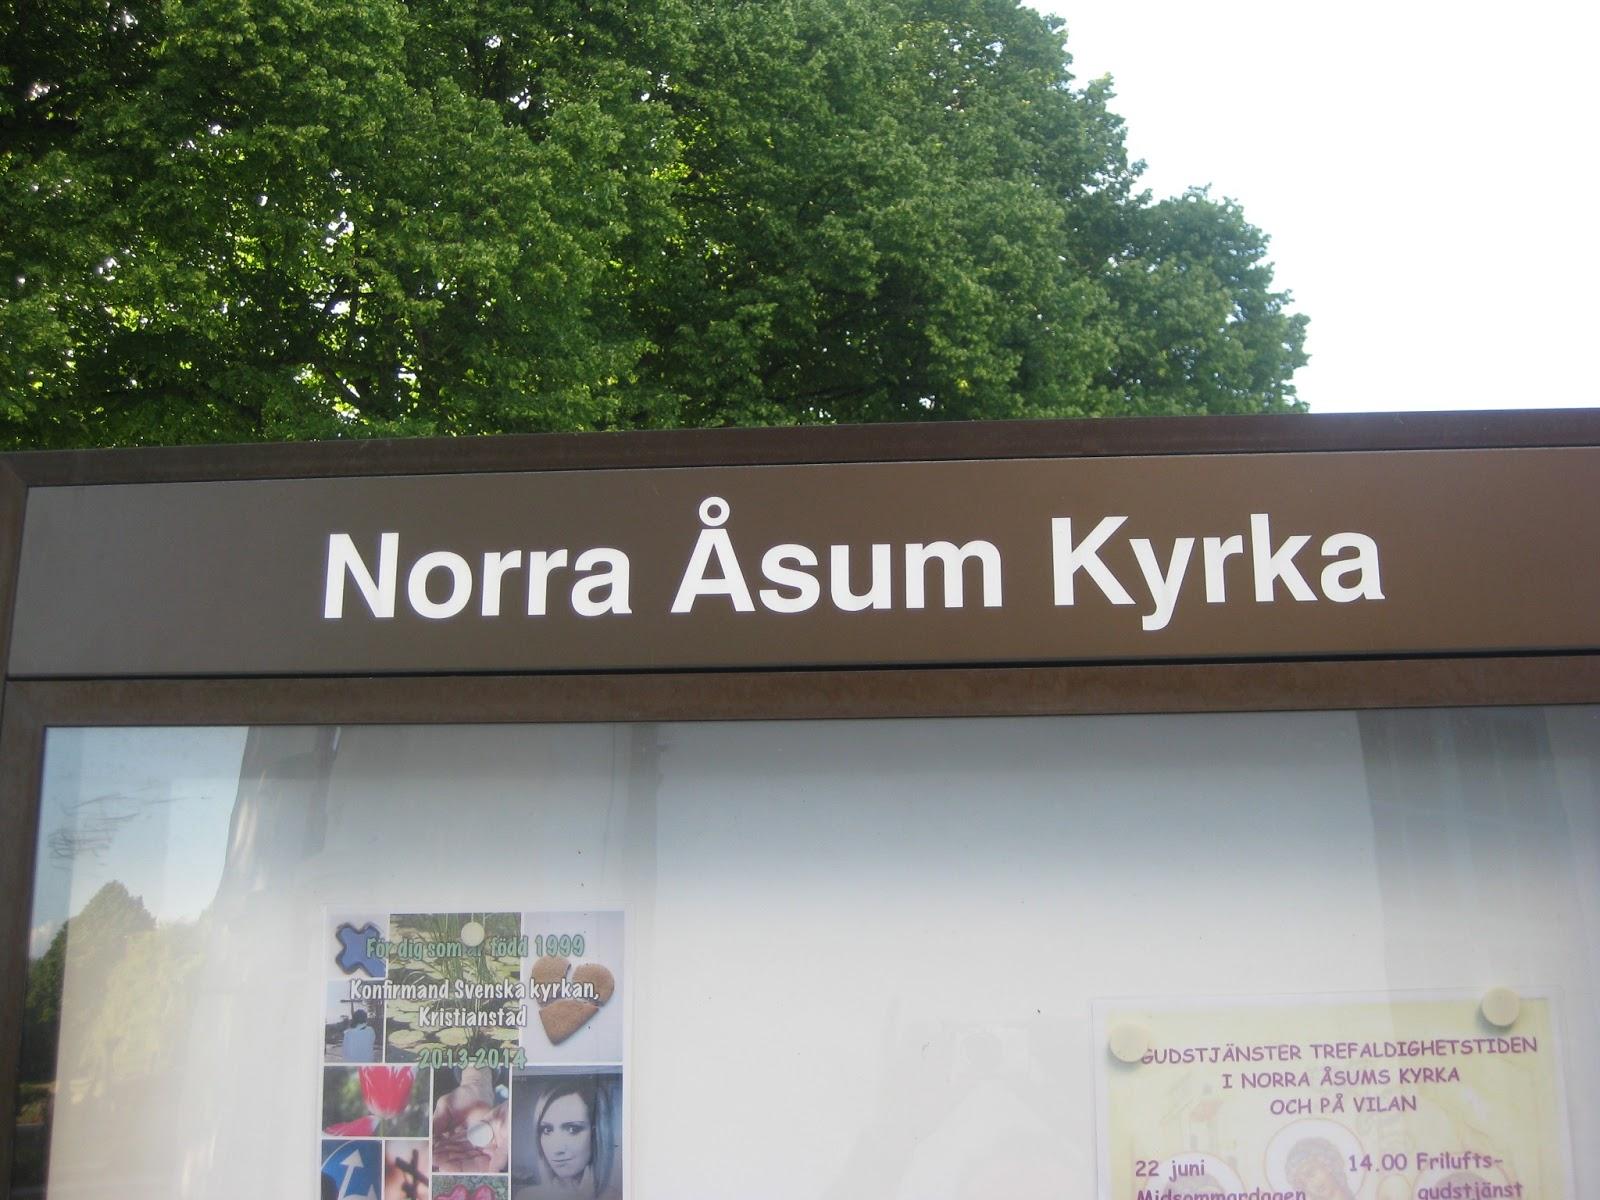 Dating Site Norra åsum